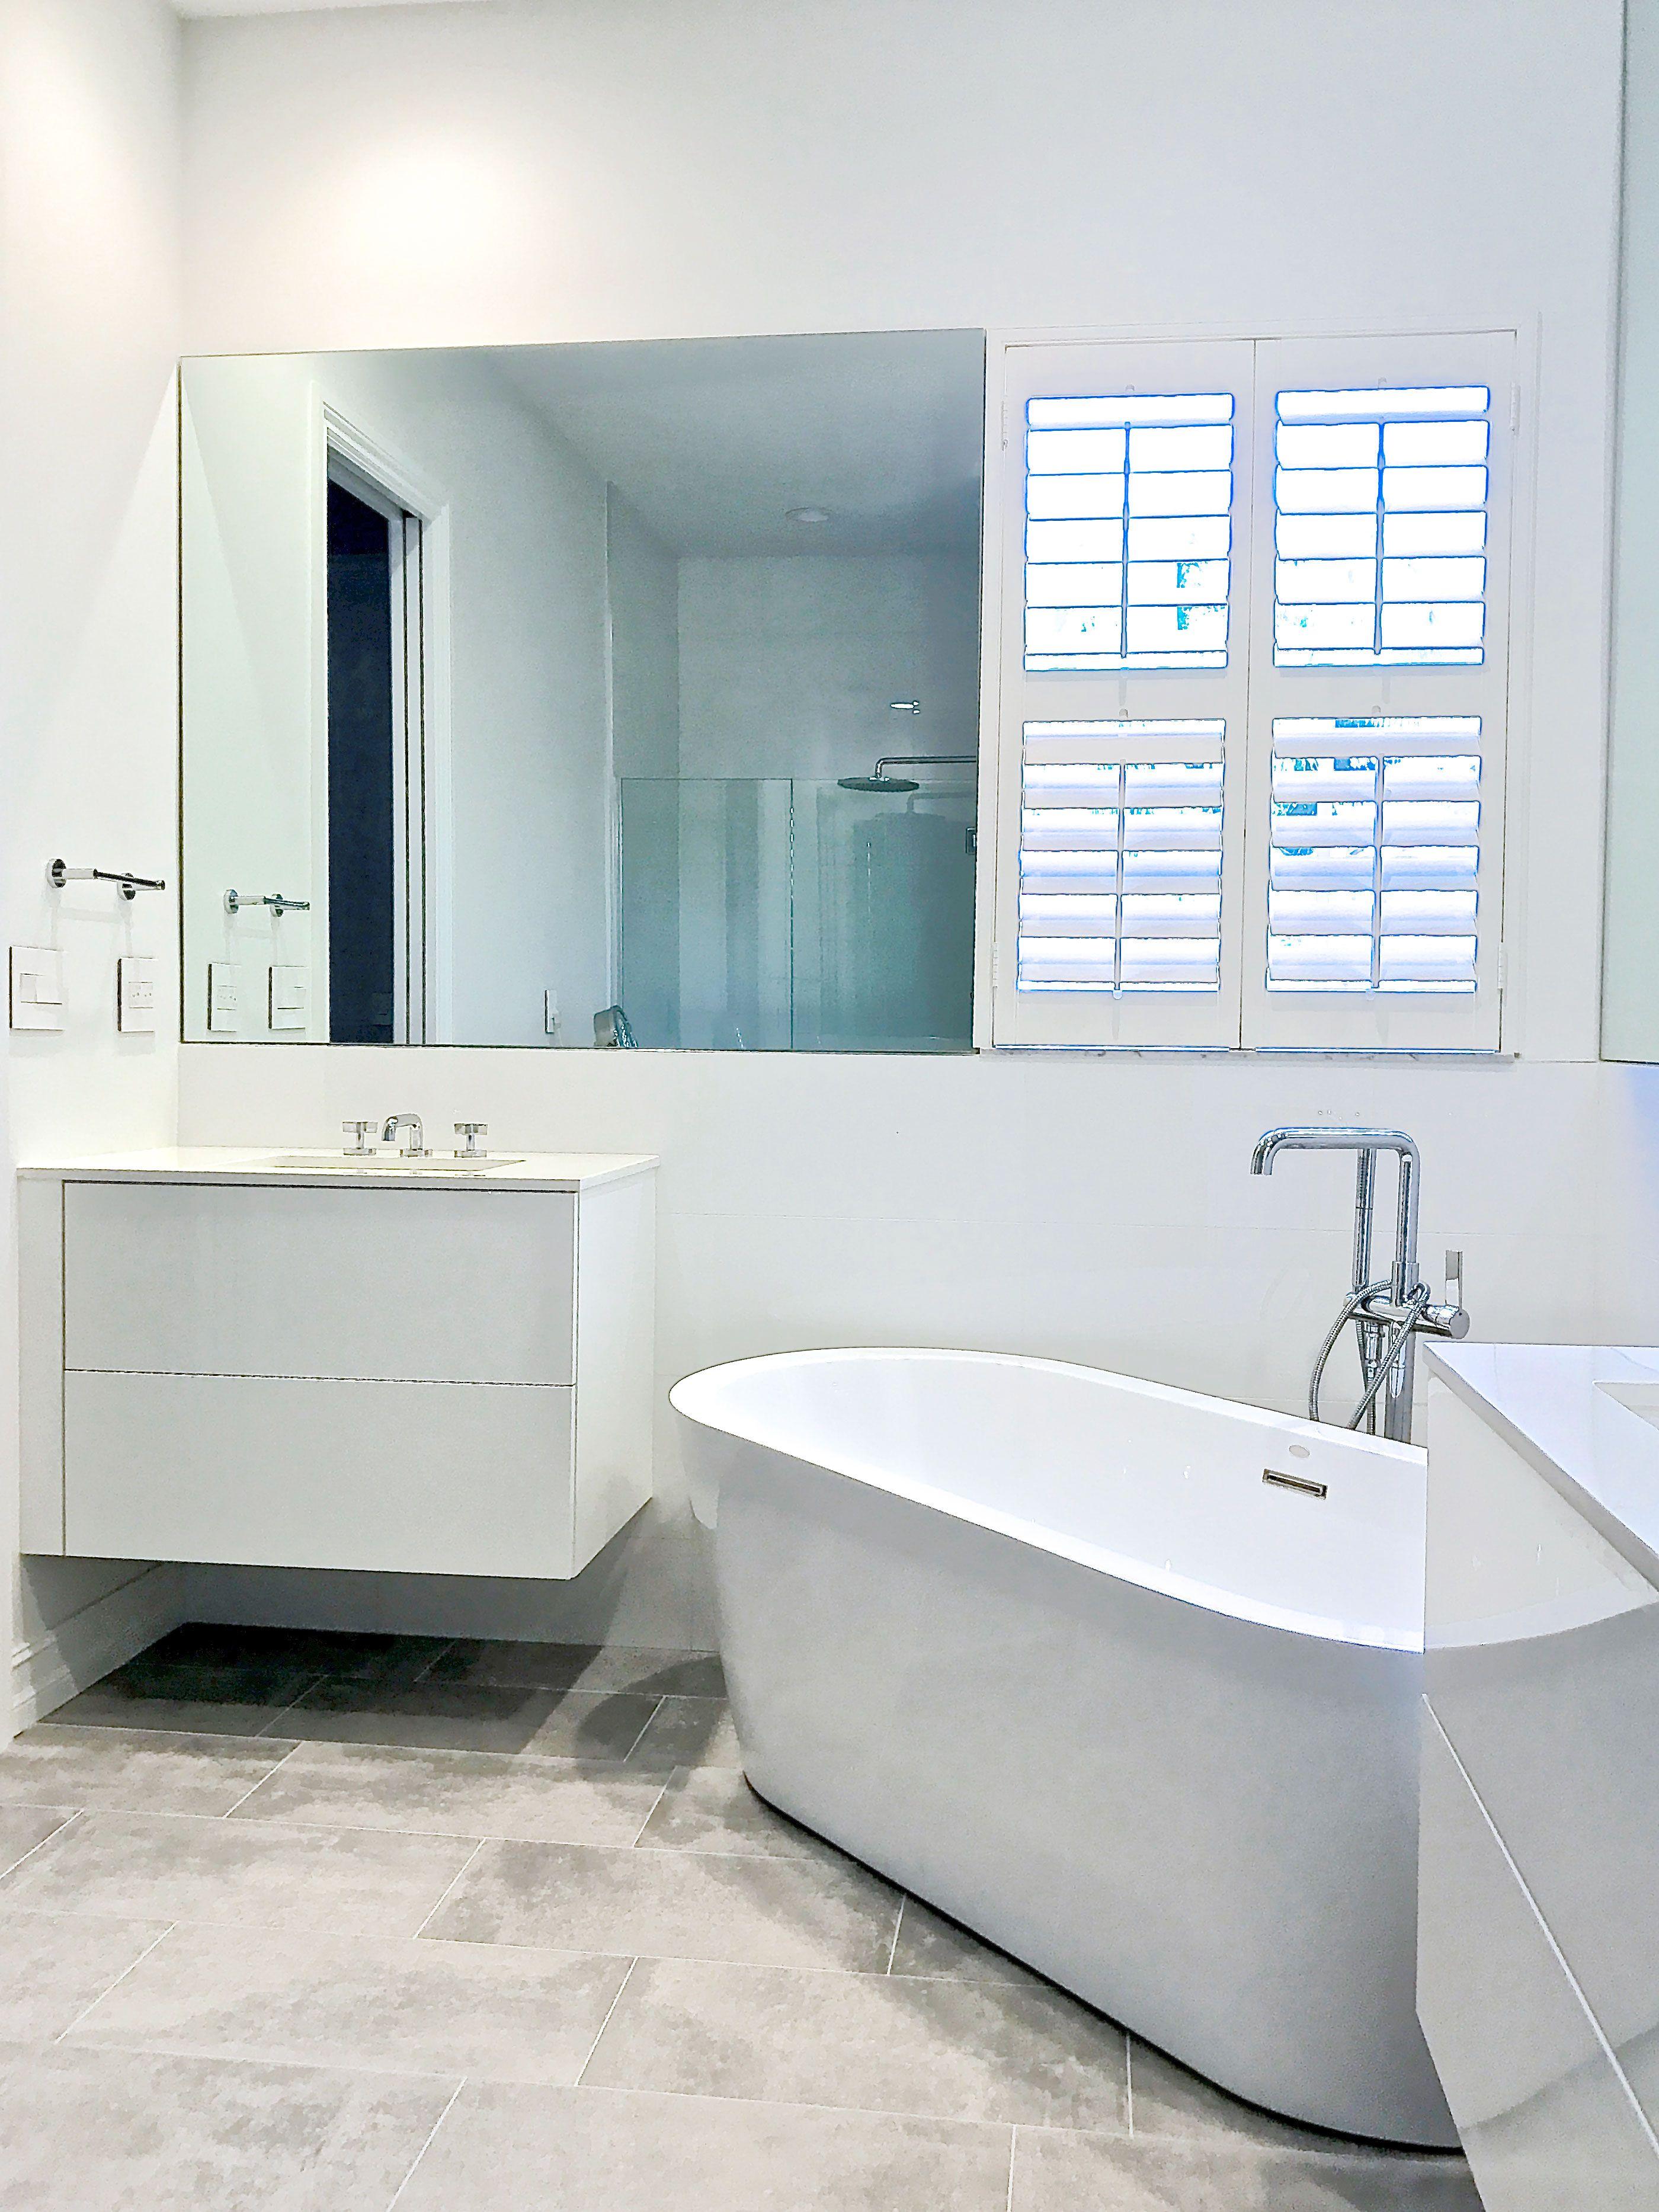 Modern bathroom by Da Vinci Cabinetry in Bonita Springs, FL | Our ...